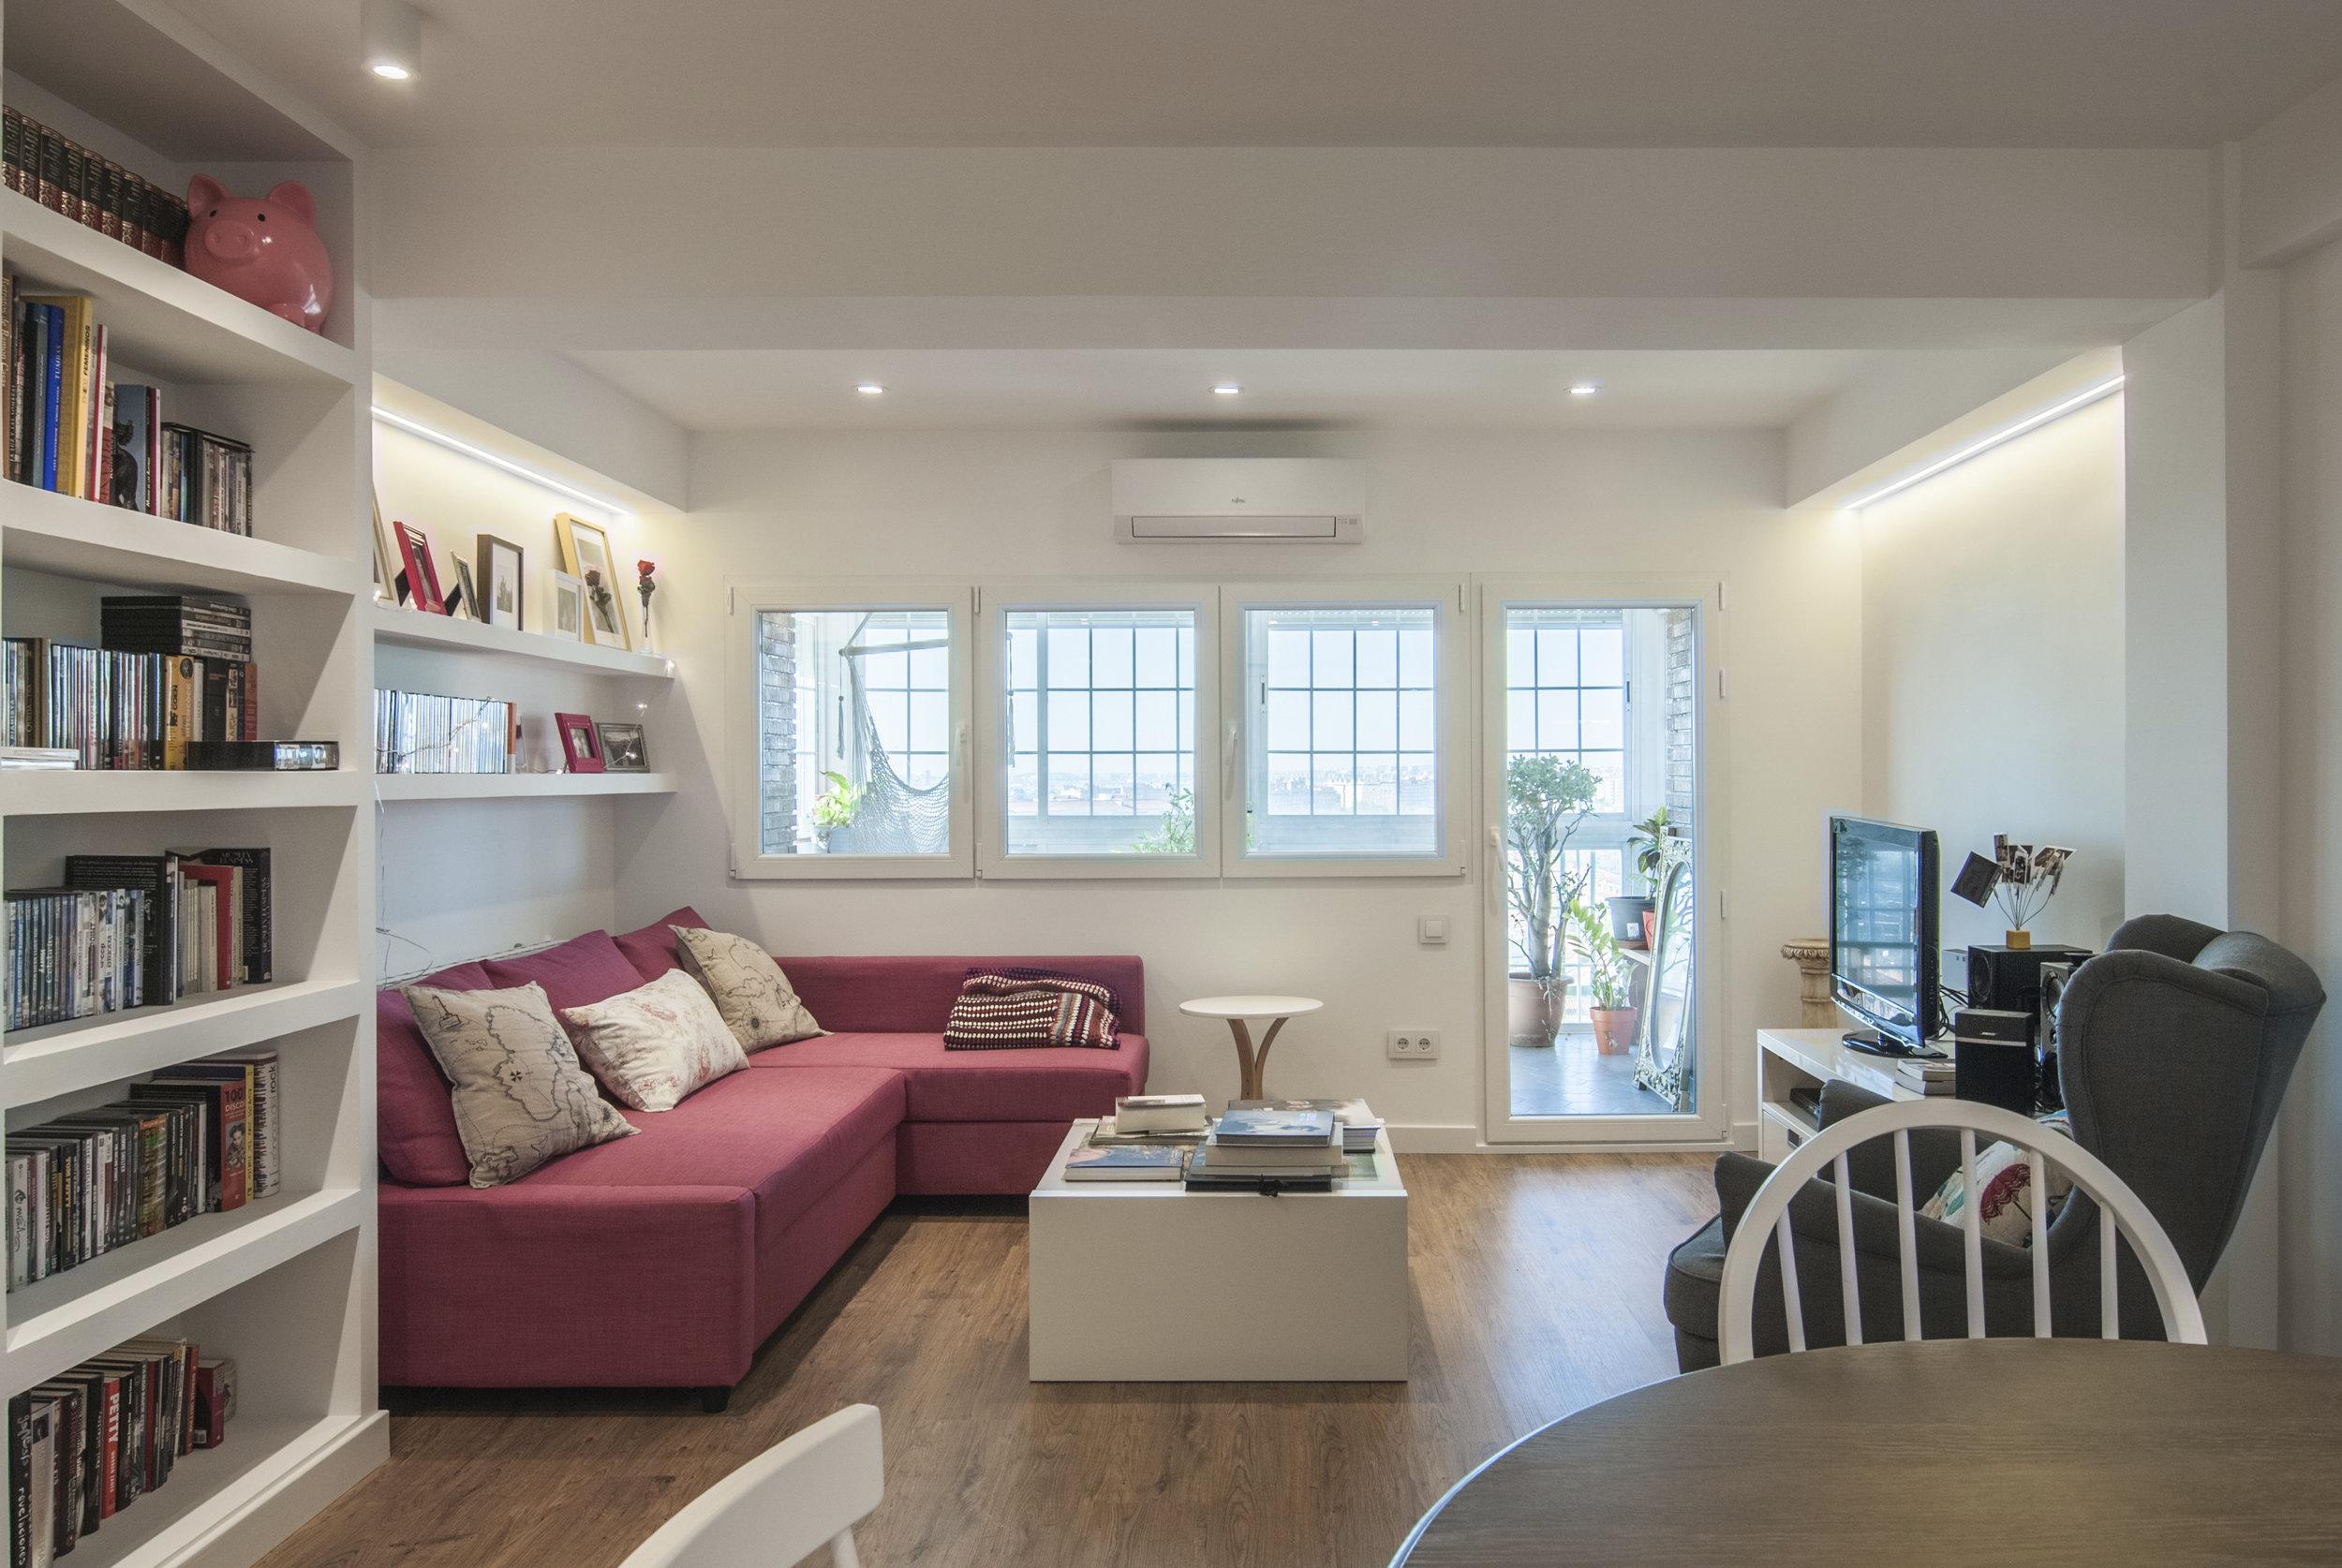 emmme studio slow design interiorismo integral salon hogar Debora.jpg